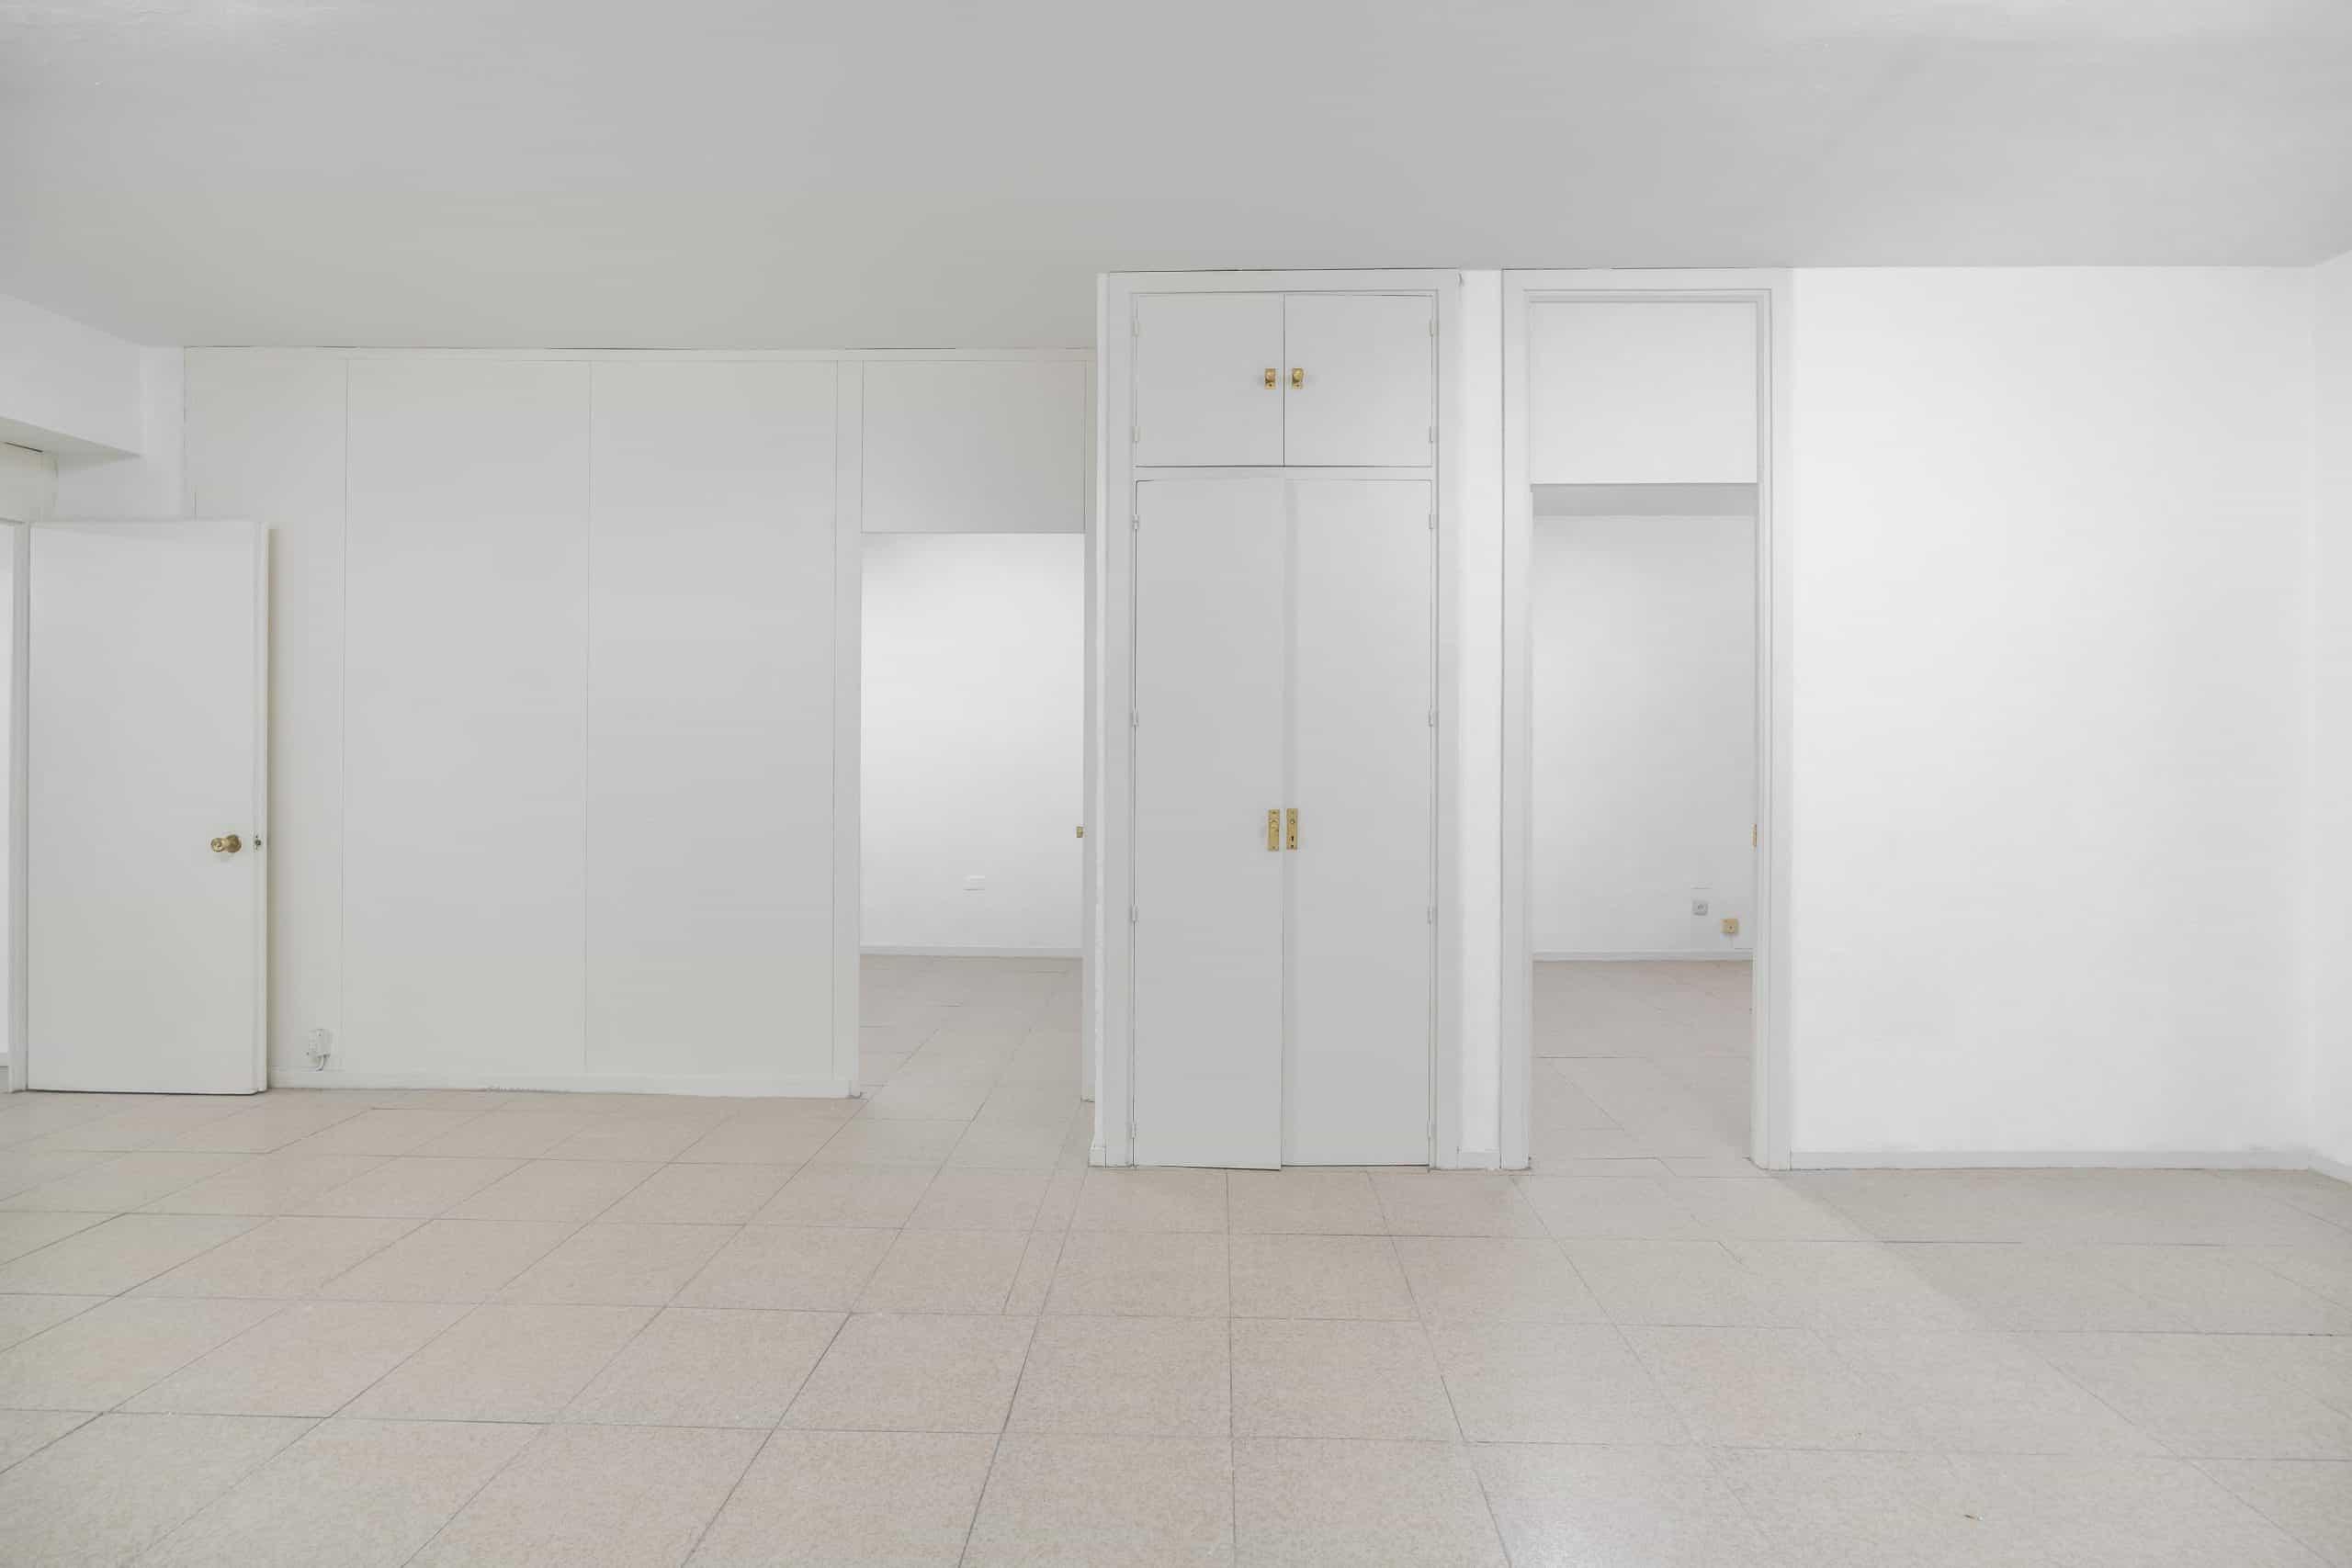 Agencia Inmobiliaria de Madrid-FUTUROCASA-Zona ARGANZUELA-LEGAZPI -calle Modesto Lafuente 41,1ºC estancia 3